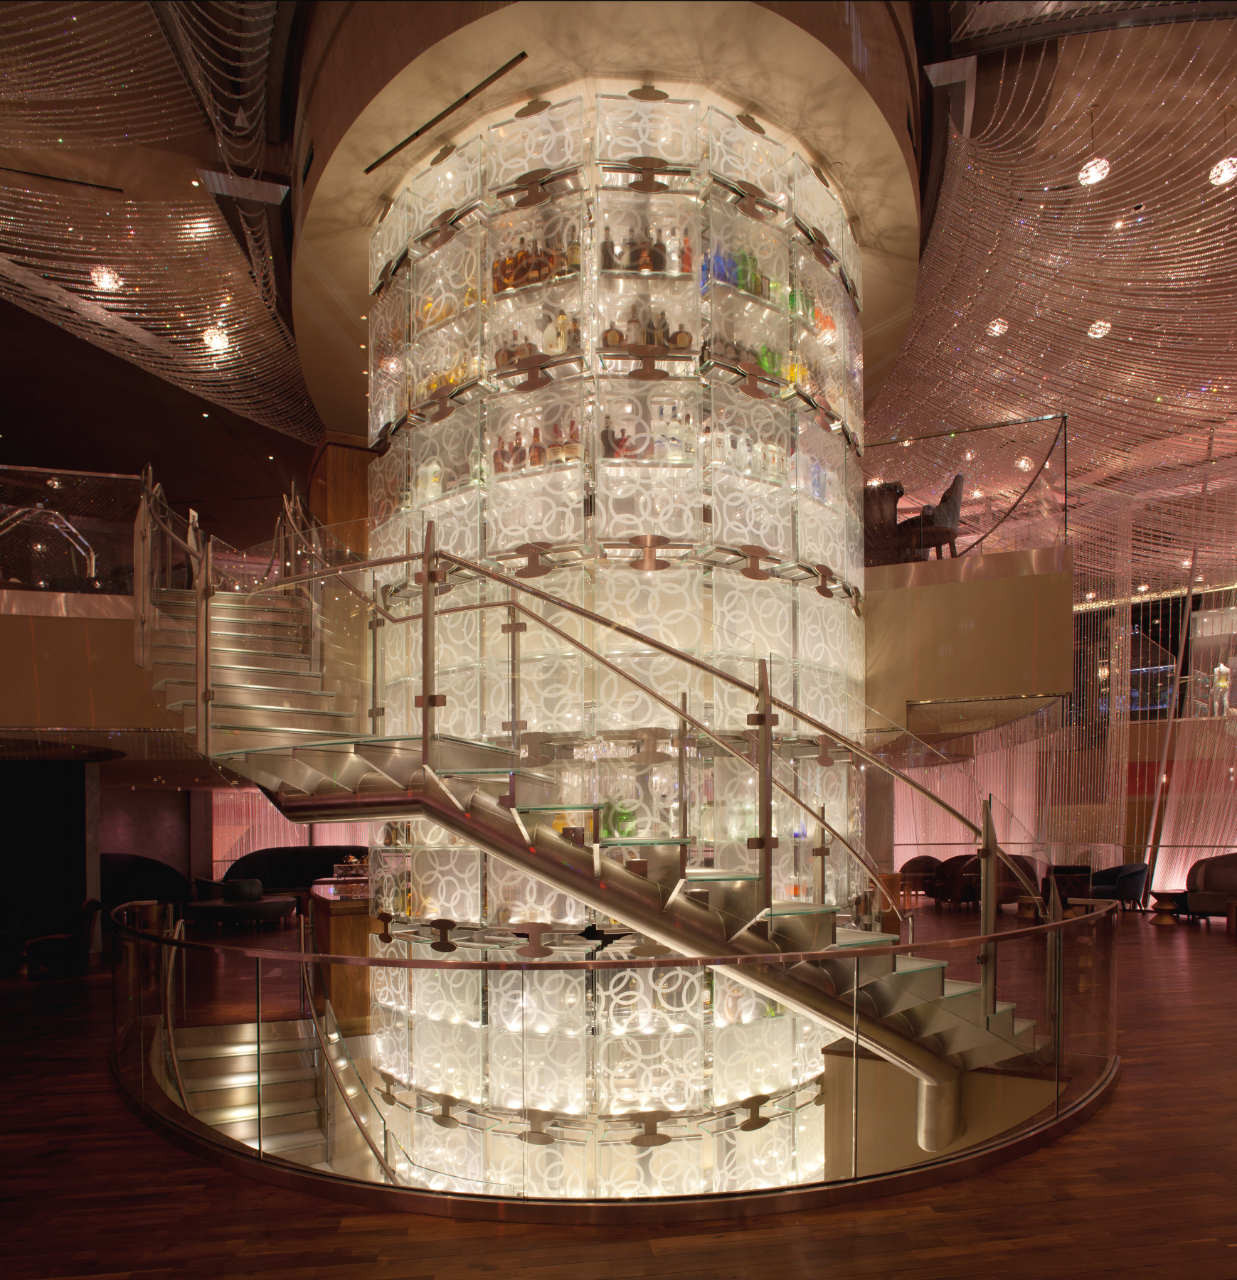 Restaurant And Bar Design: Gallery Of The Cosmopolitan Of Las Vegas Interior